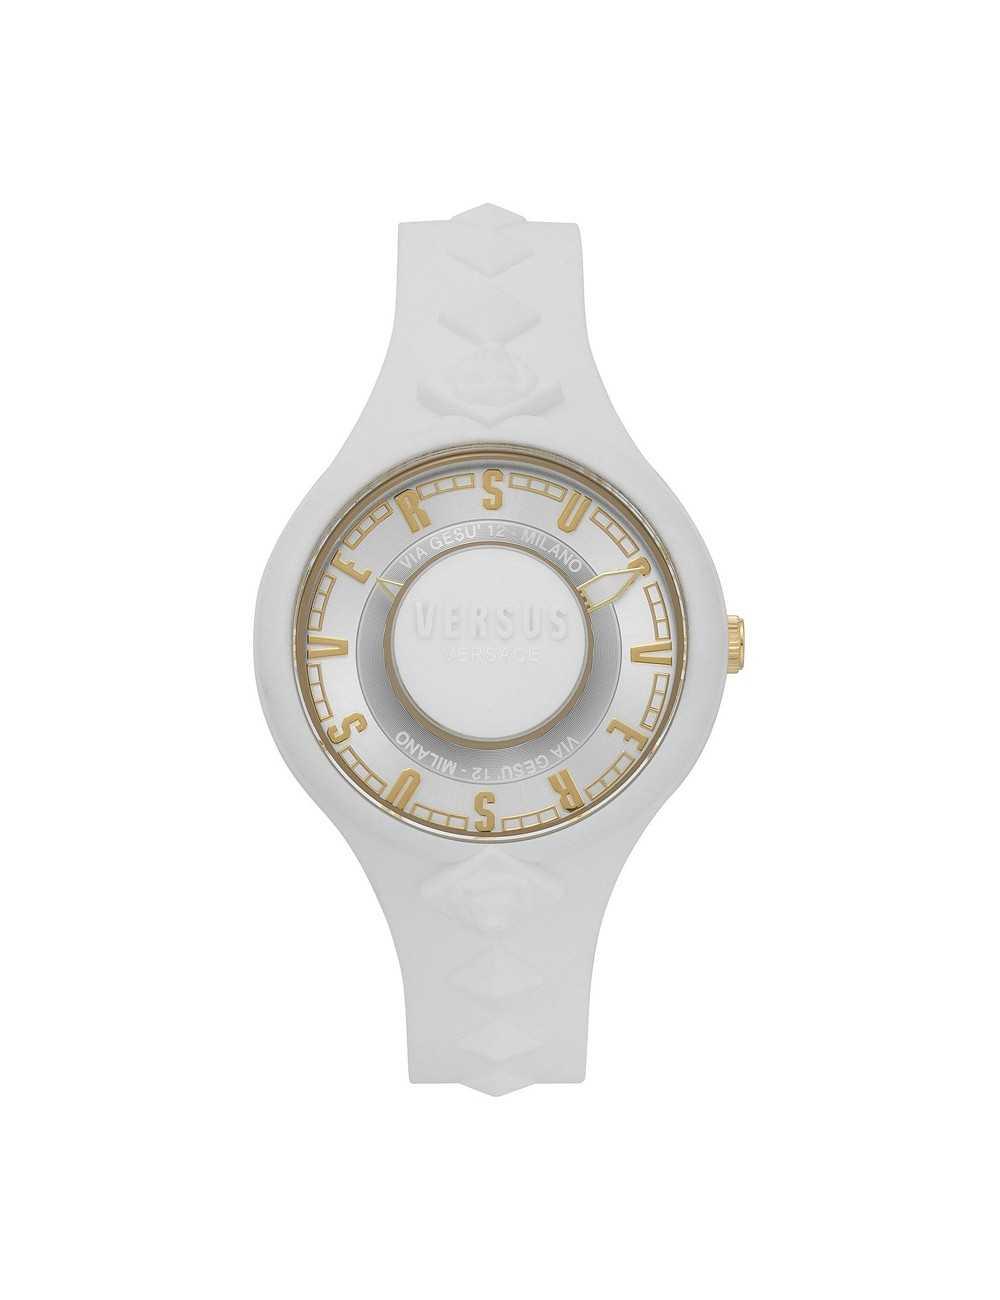 Dámske hodinky Versus VSP1R0219 Tokai